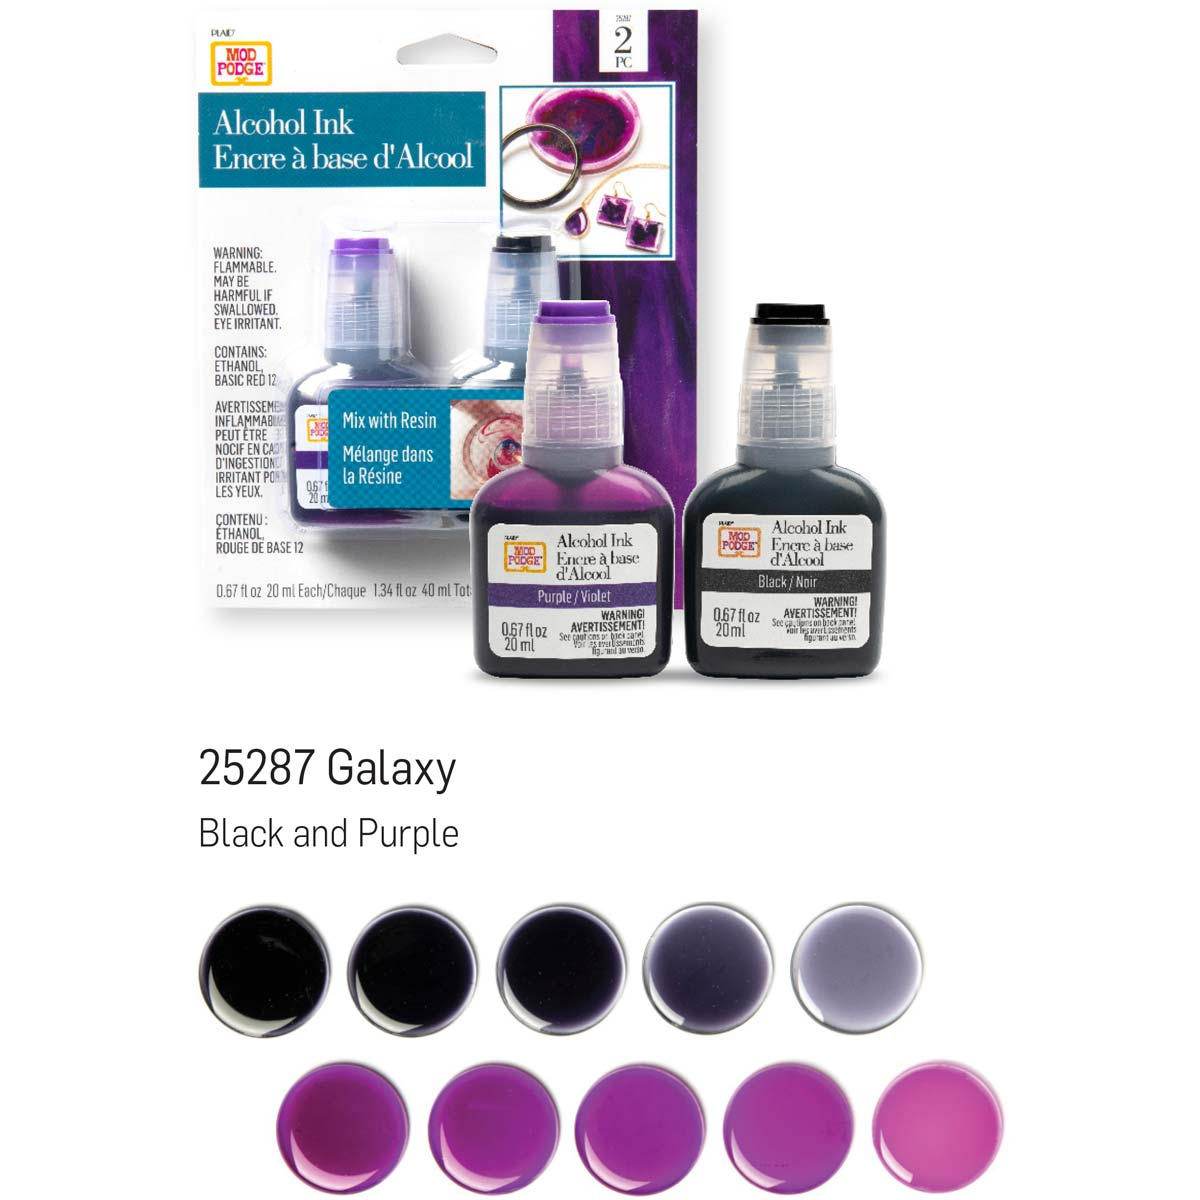 Mod Podge ® Alcohol Ink Set - Galaxy, 2 pc. - 25287